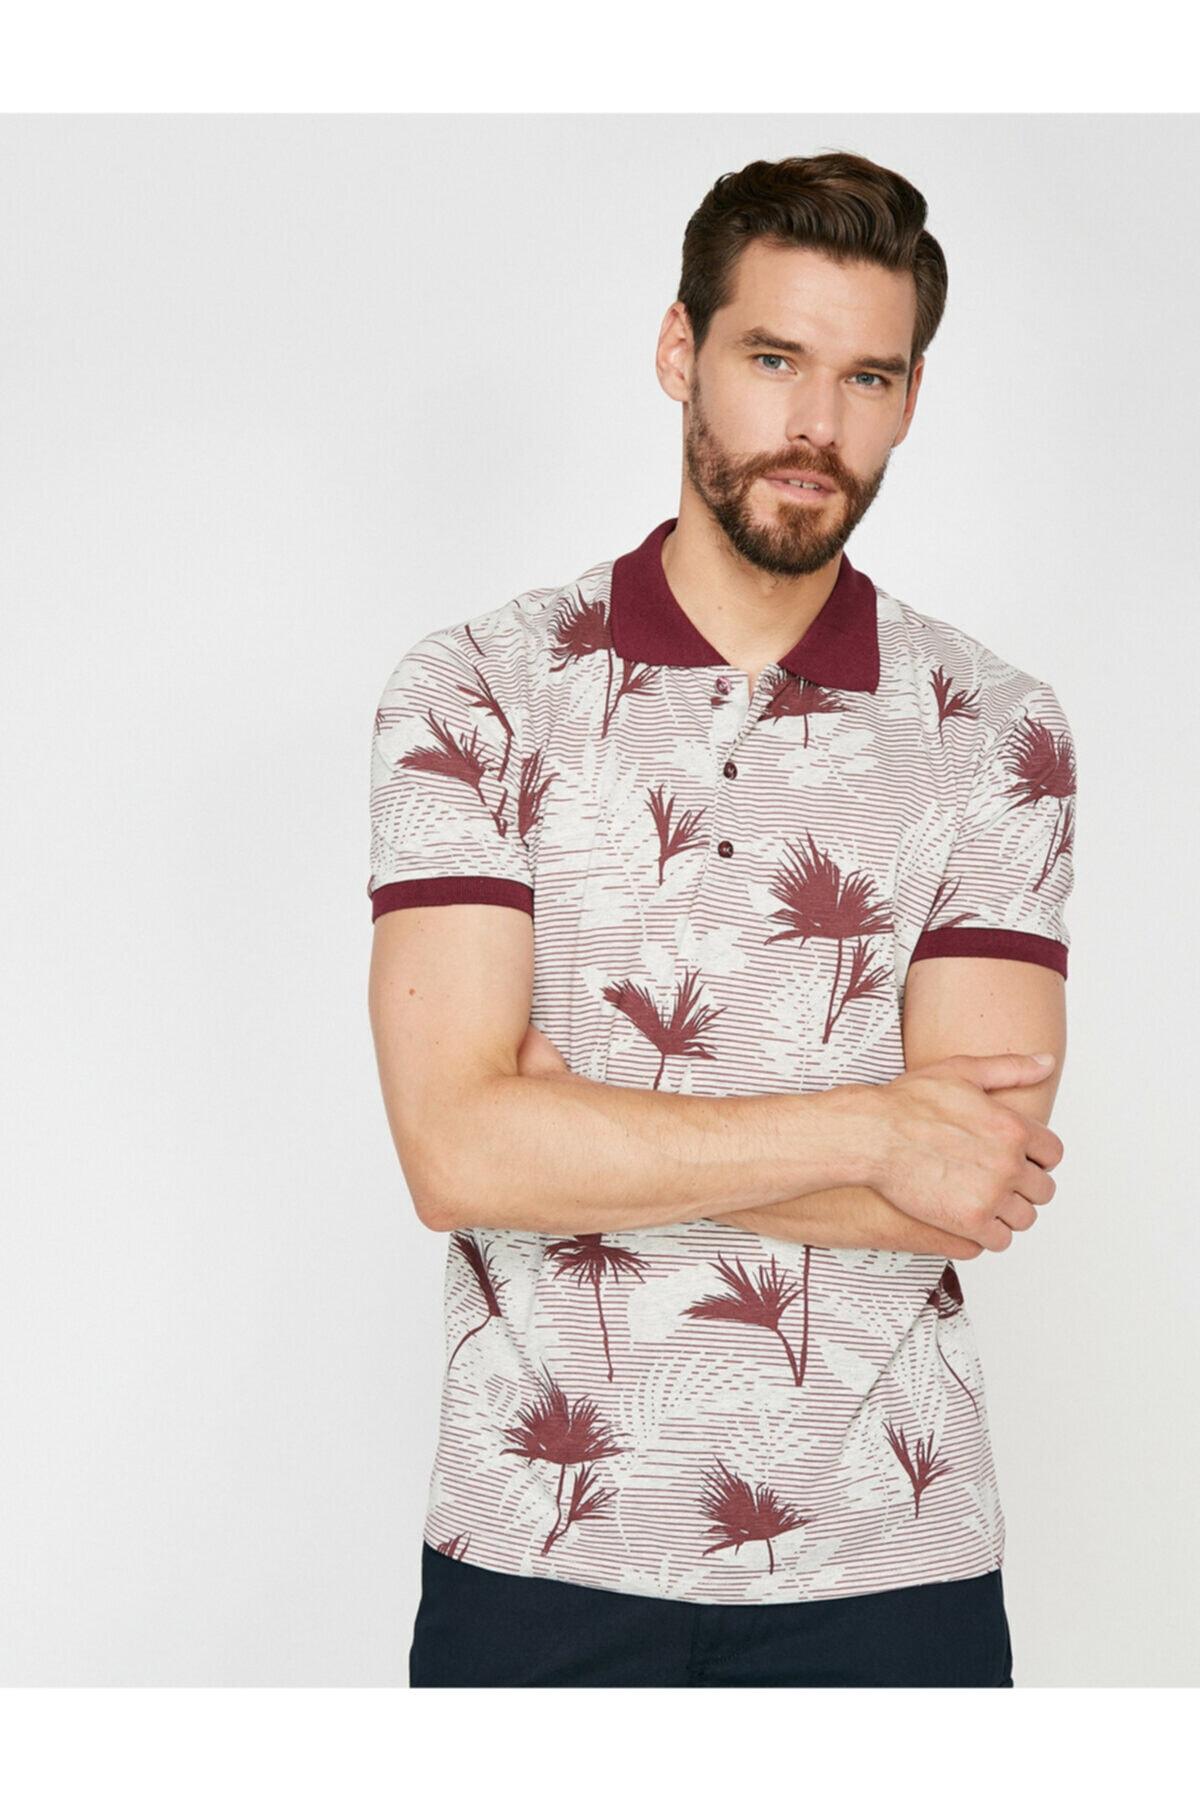 پولوشرت مردانه فروش برند کوتون رنگ زرشکی ty6899750